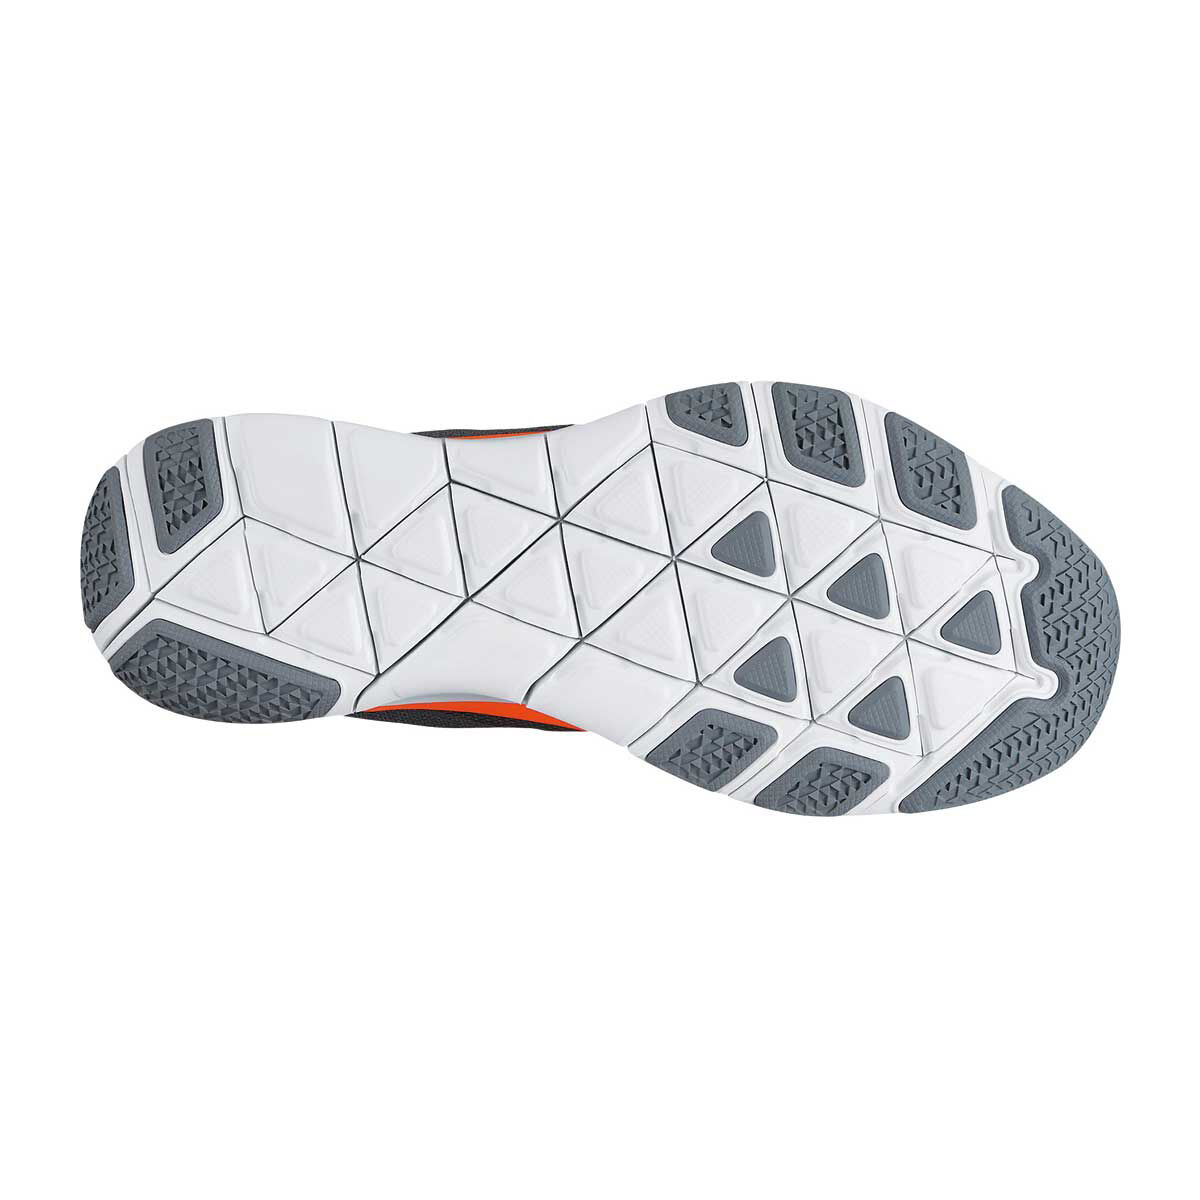 Nike Free Trainer V7  Hombres Zapatillas De Entrenamiento Gris  V7 Naranja. 75bdfd